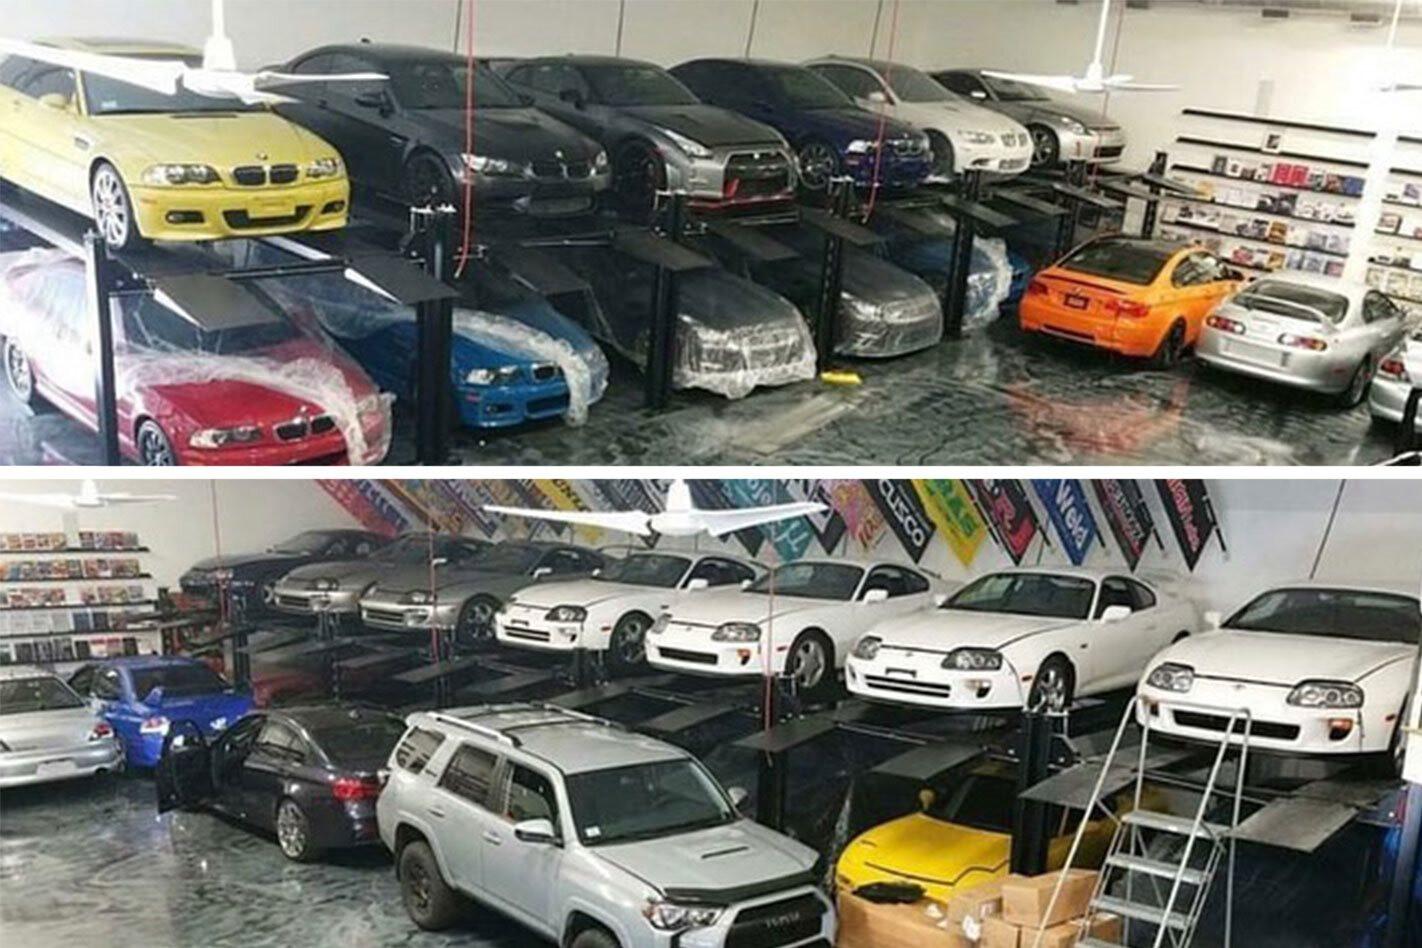 Modern classic cars found during police raid